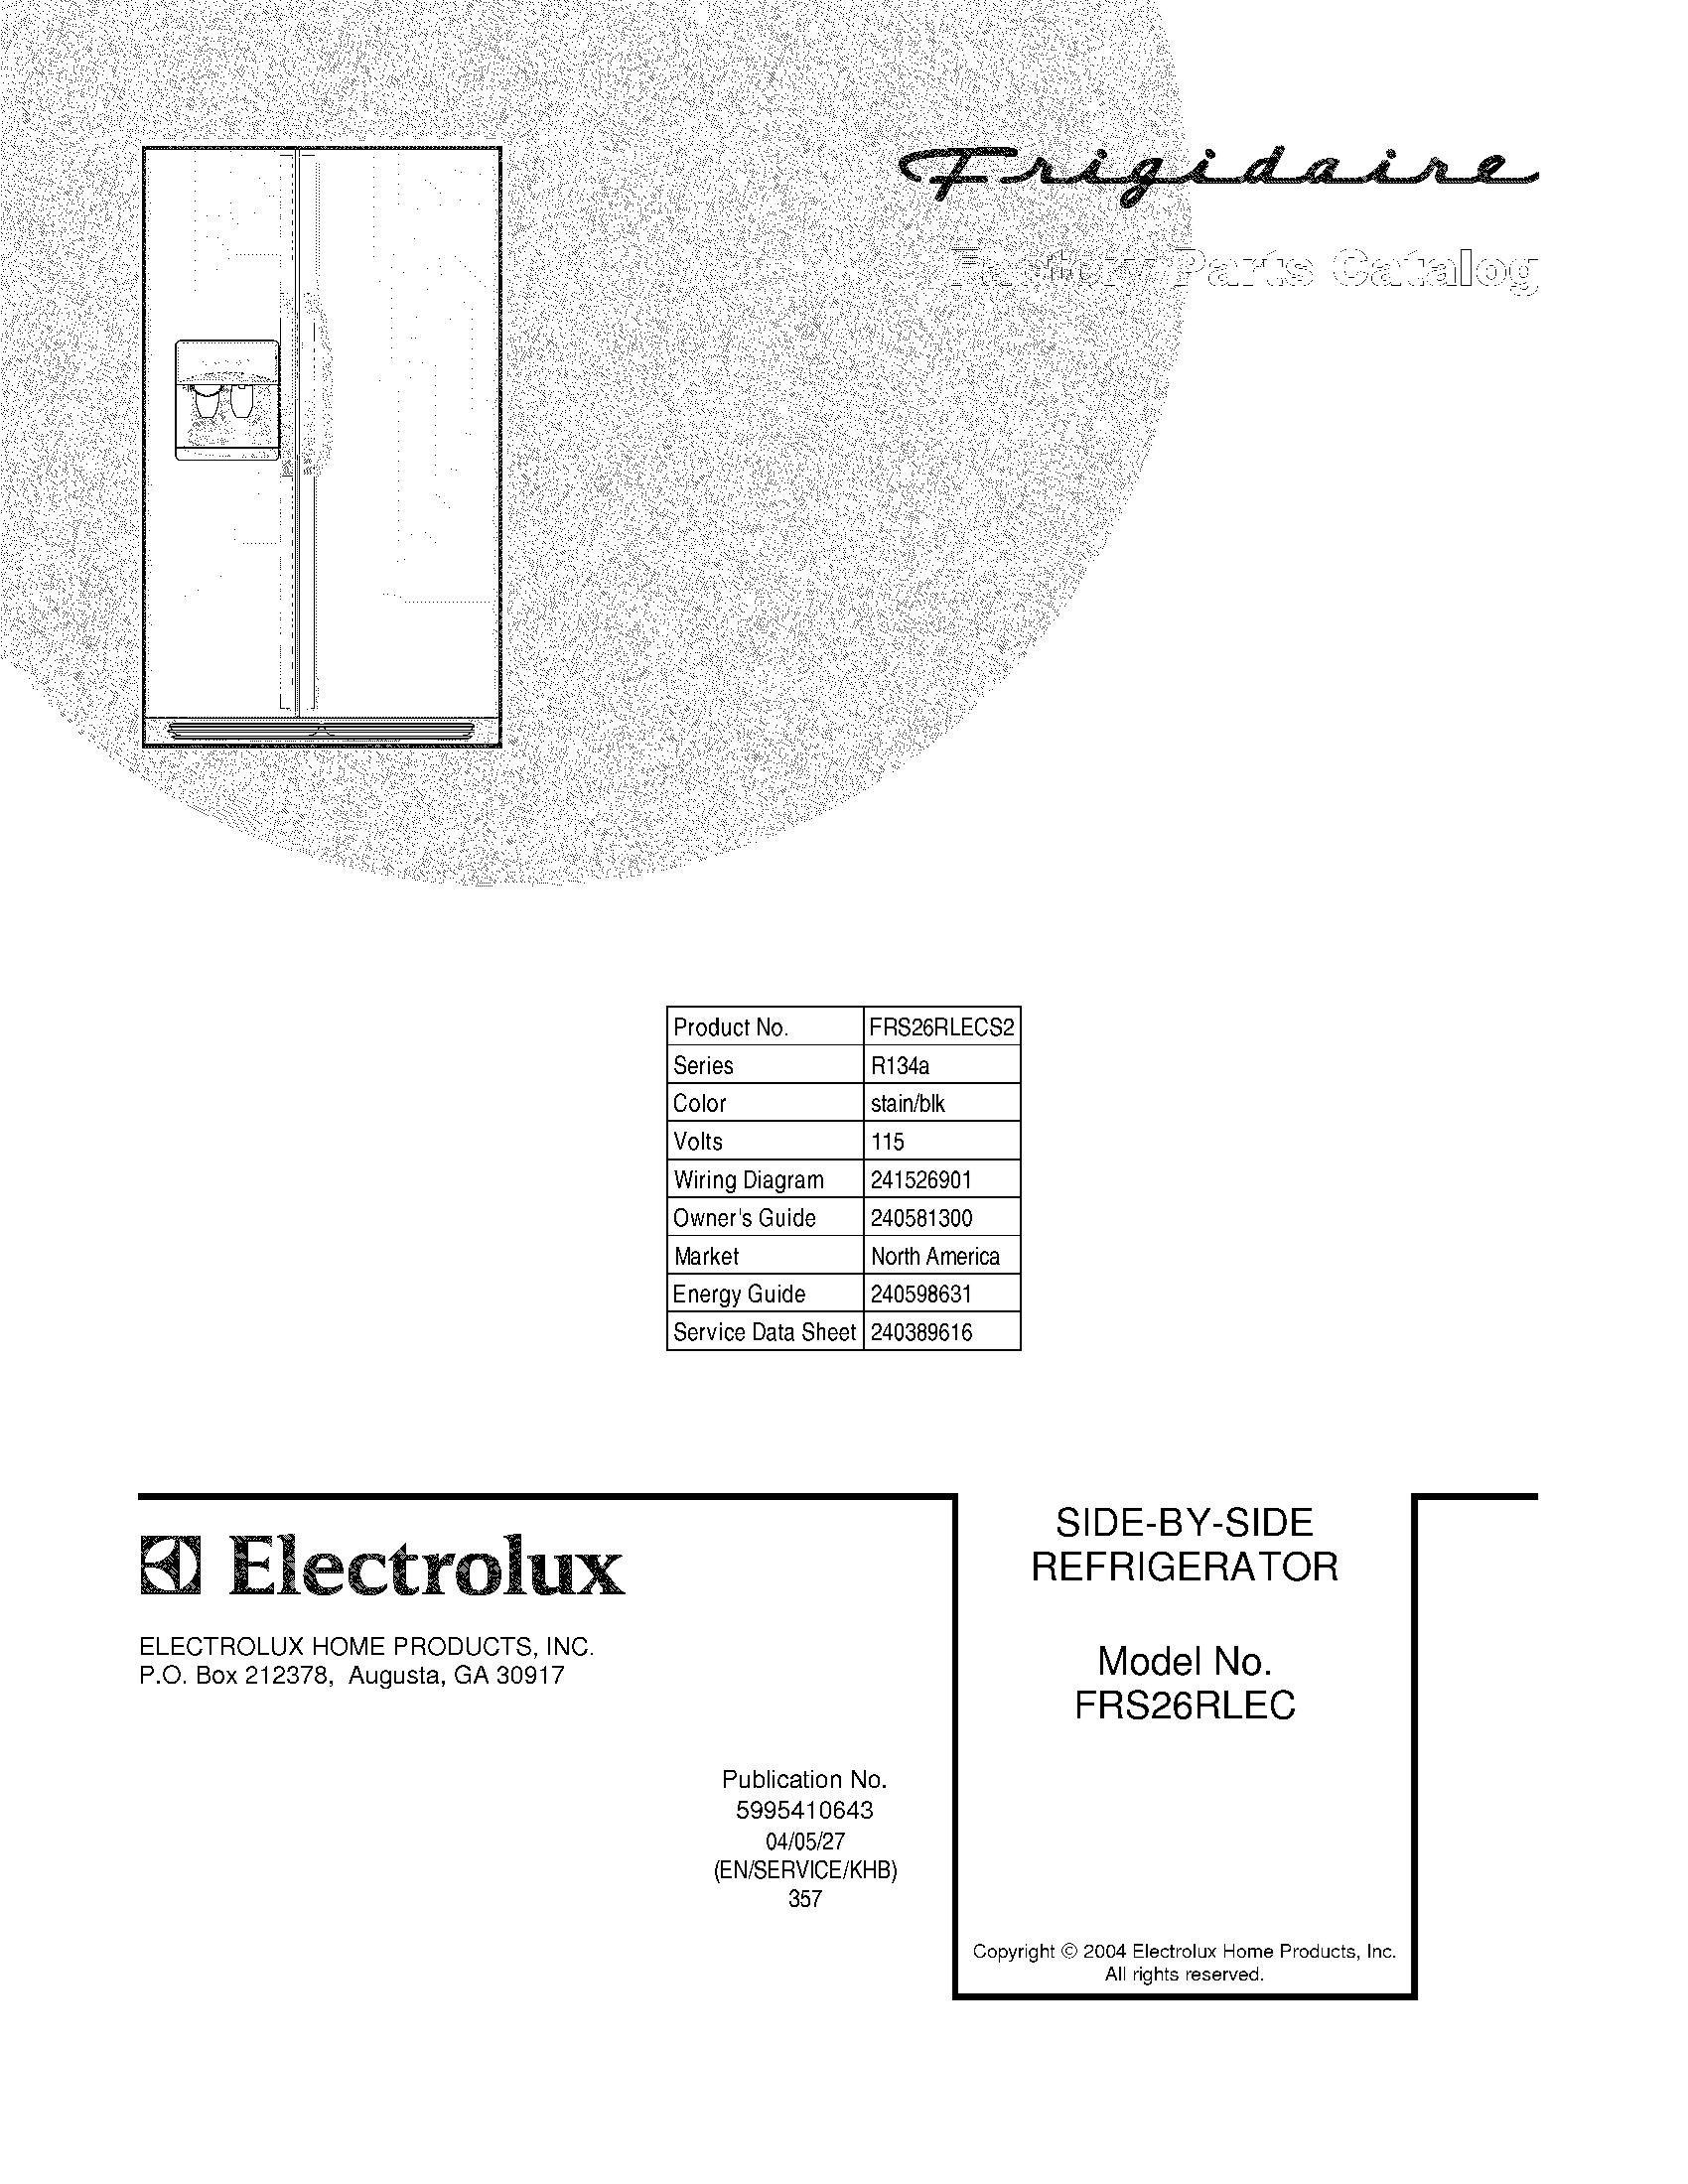 wiring diagram for 1999 john deere 455 john deere 425